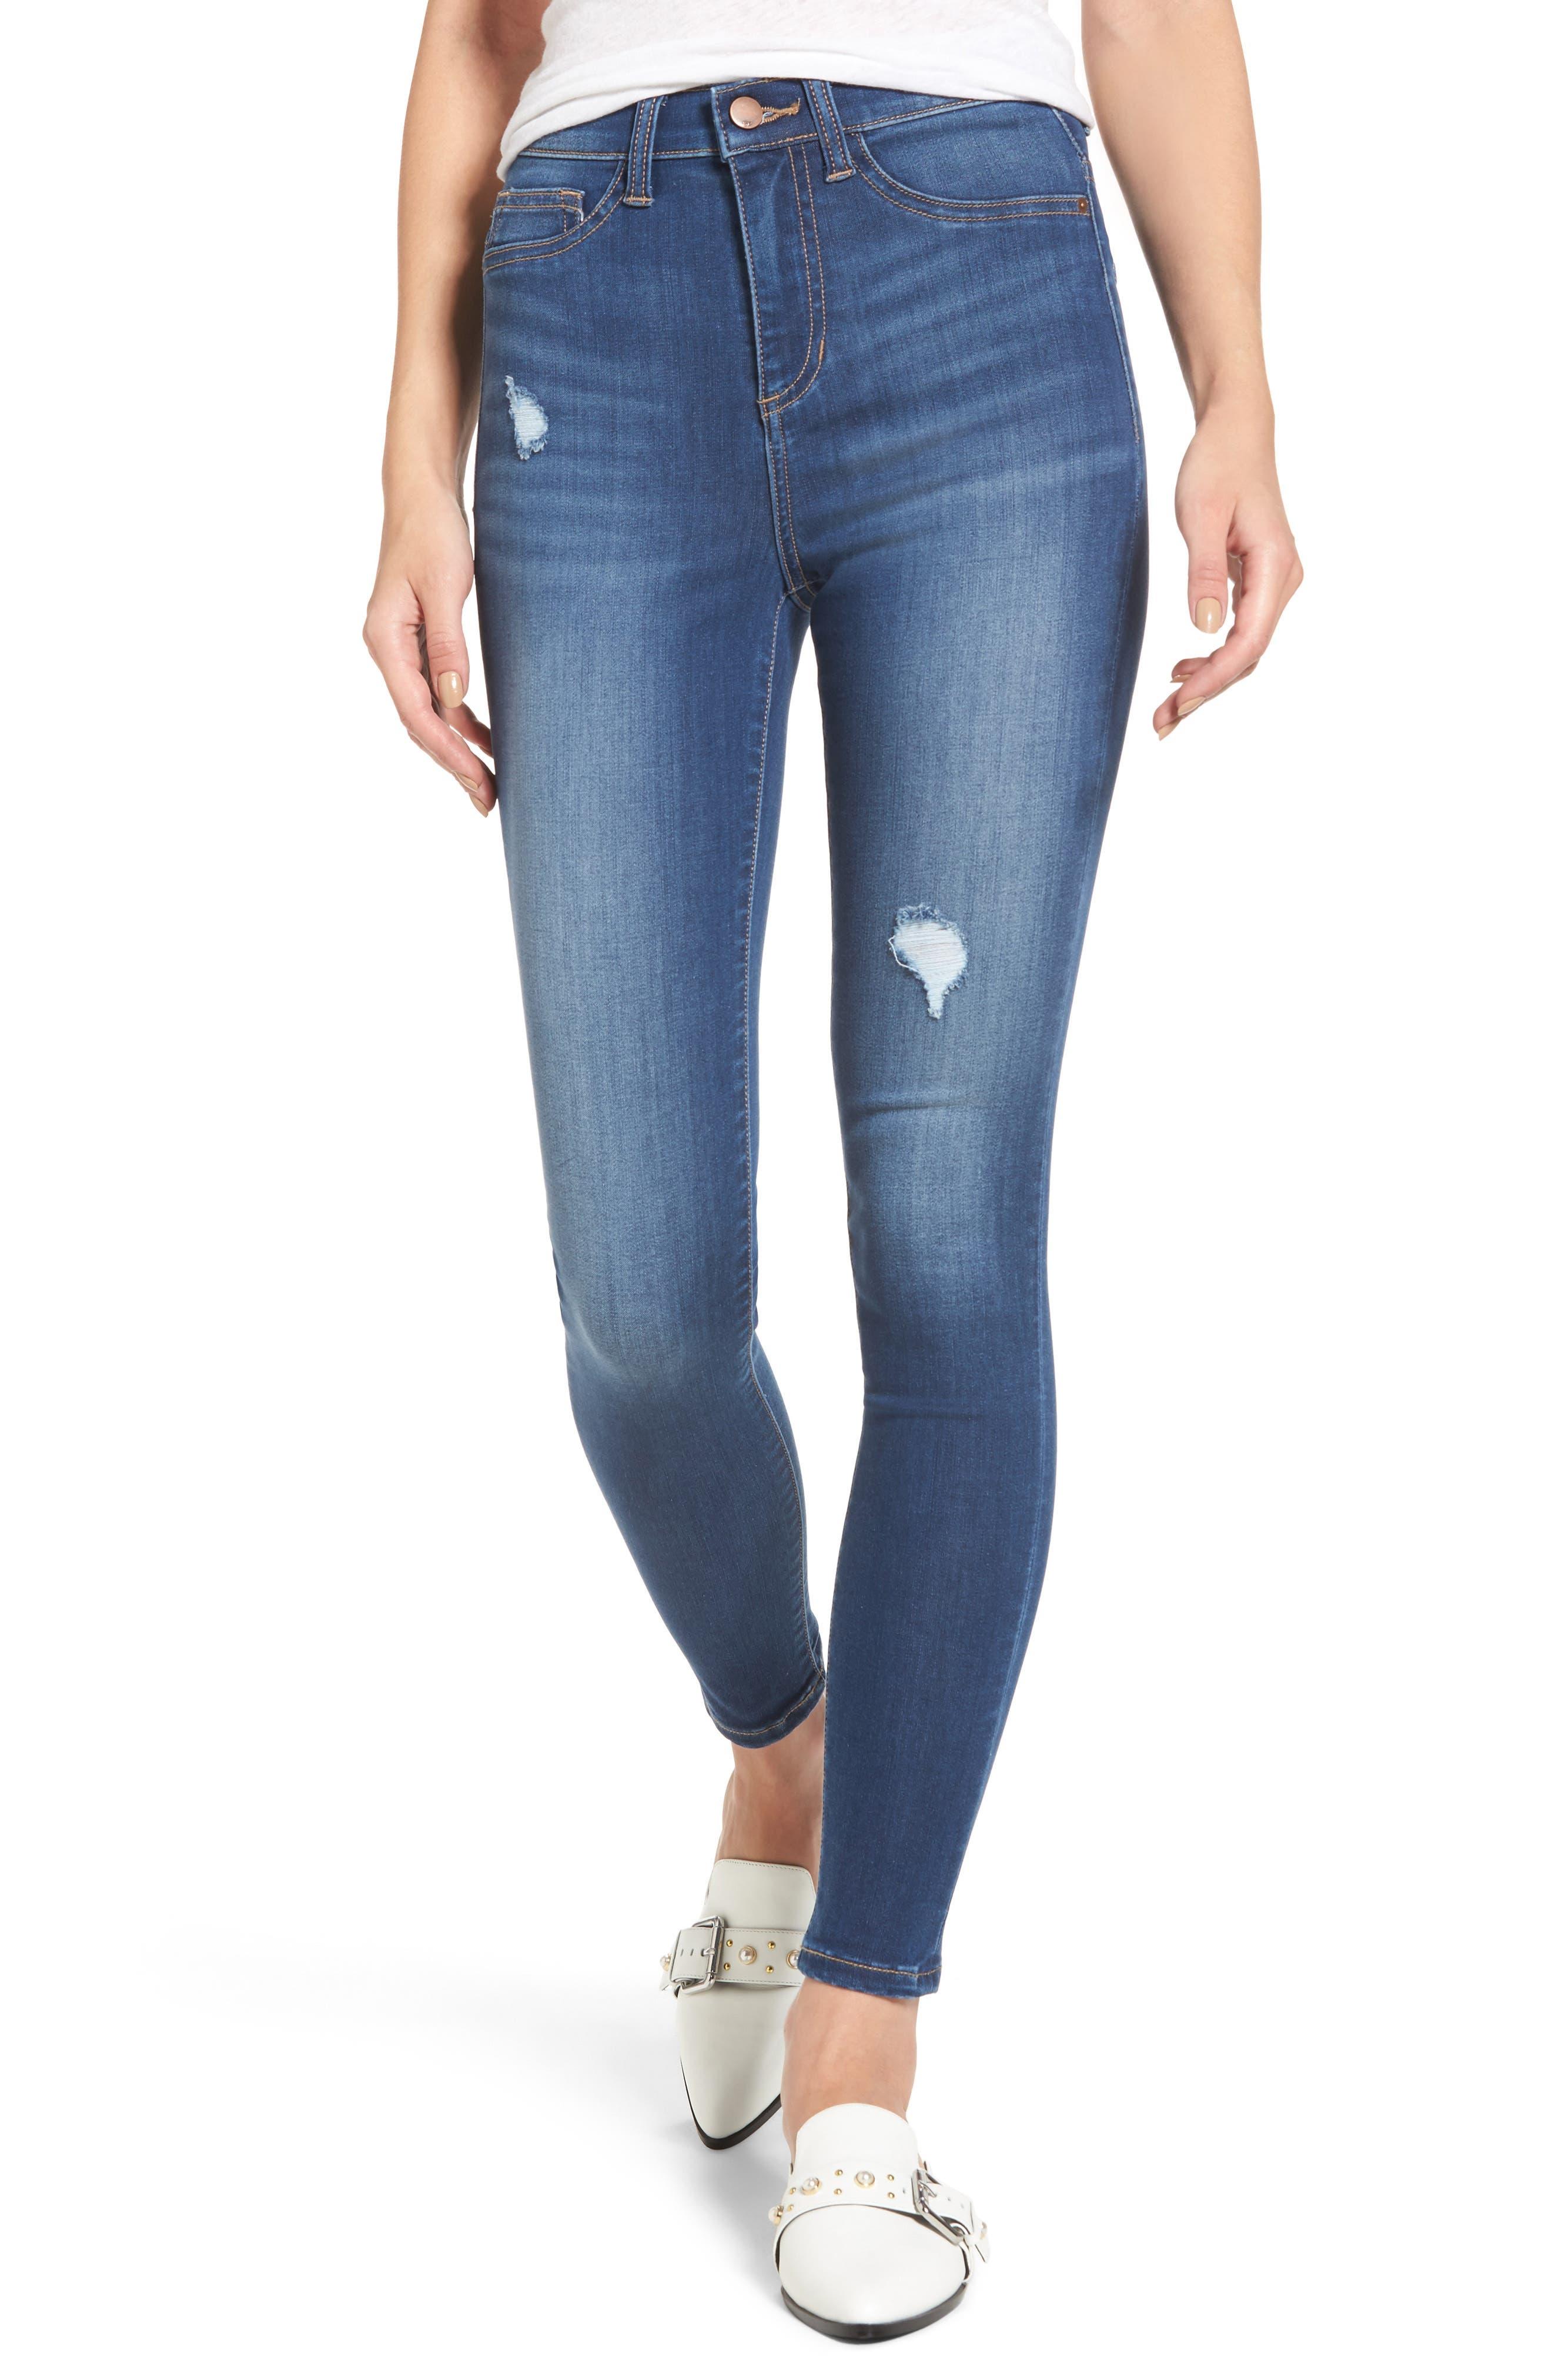 Alternate Image 1 Selected - SP Black High Waist Skinny Jeans